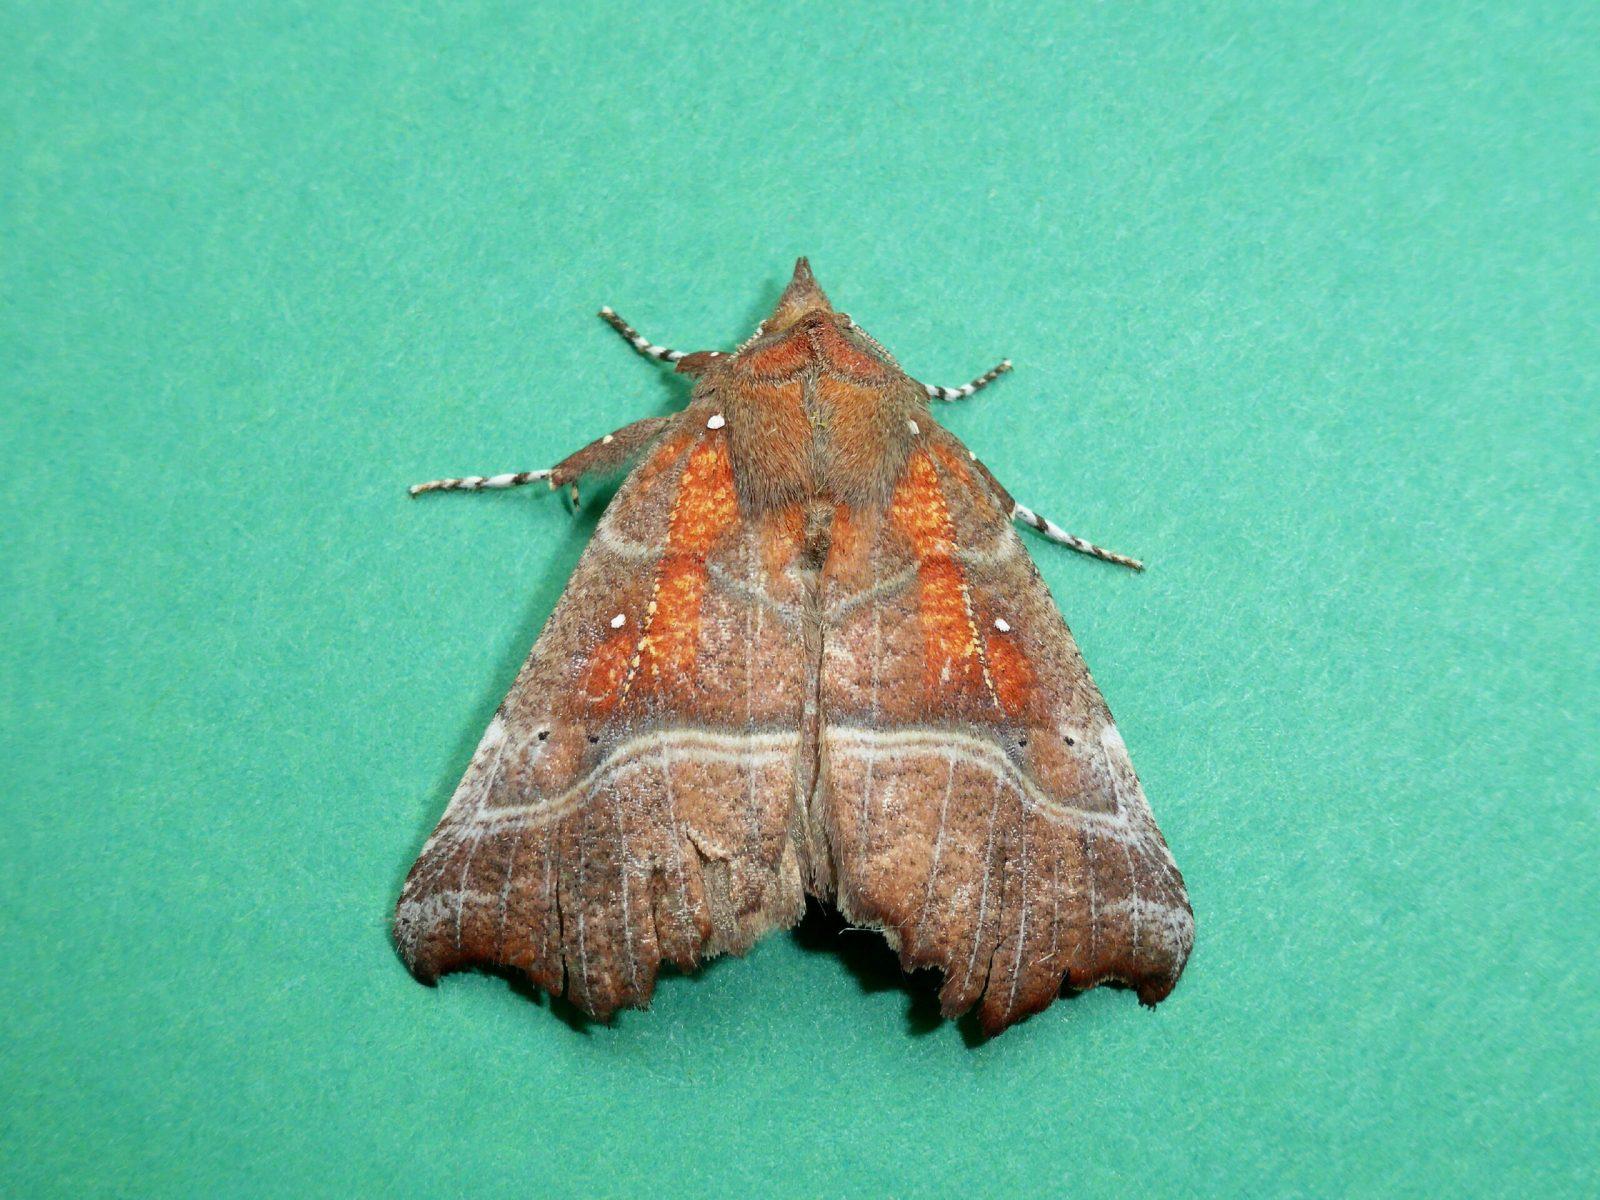 Scoliopteryx libatrix - Herald - Kirk Smeaton